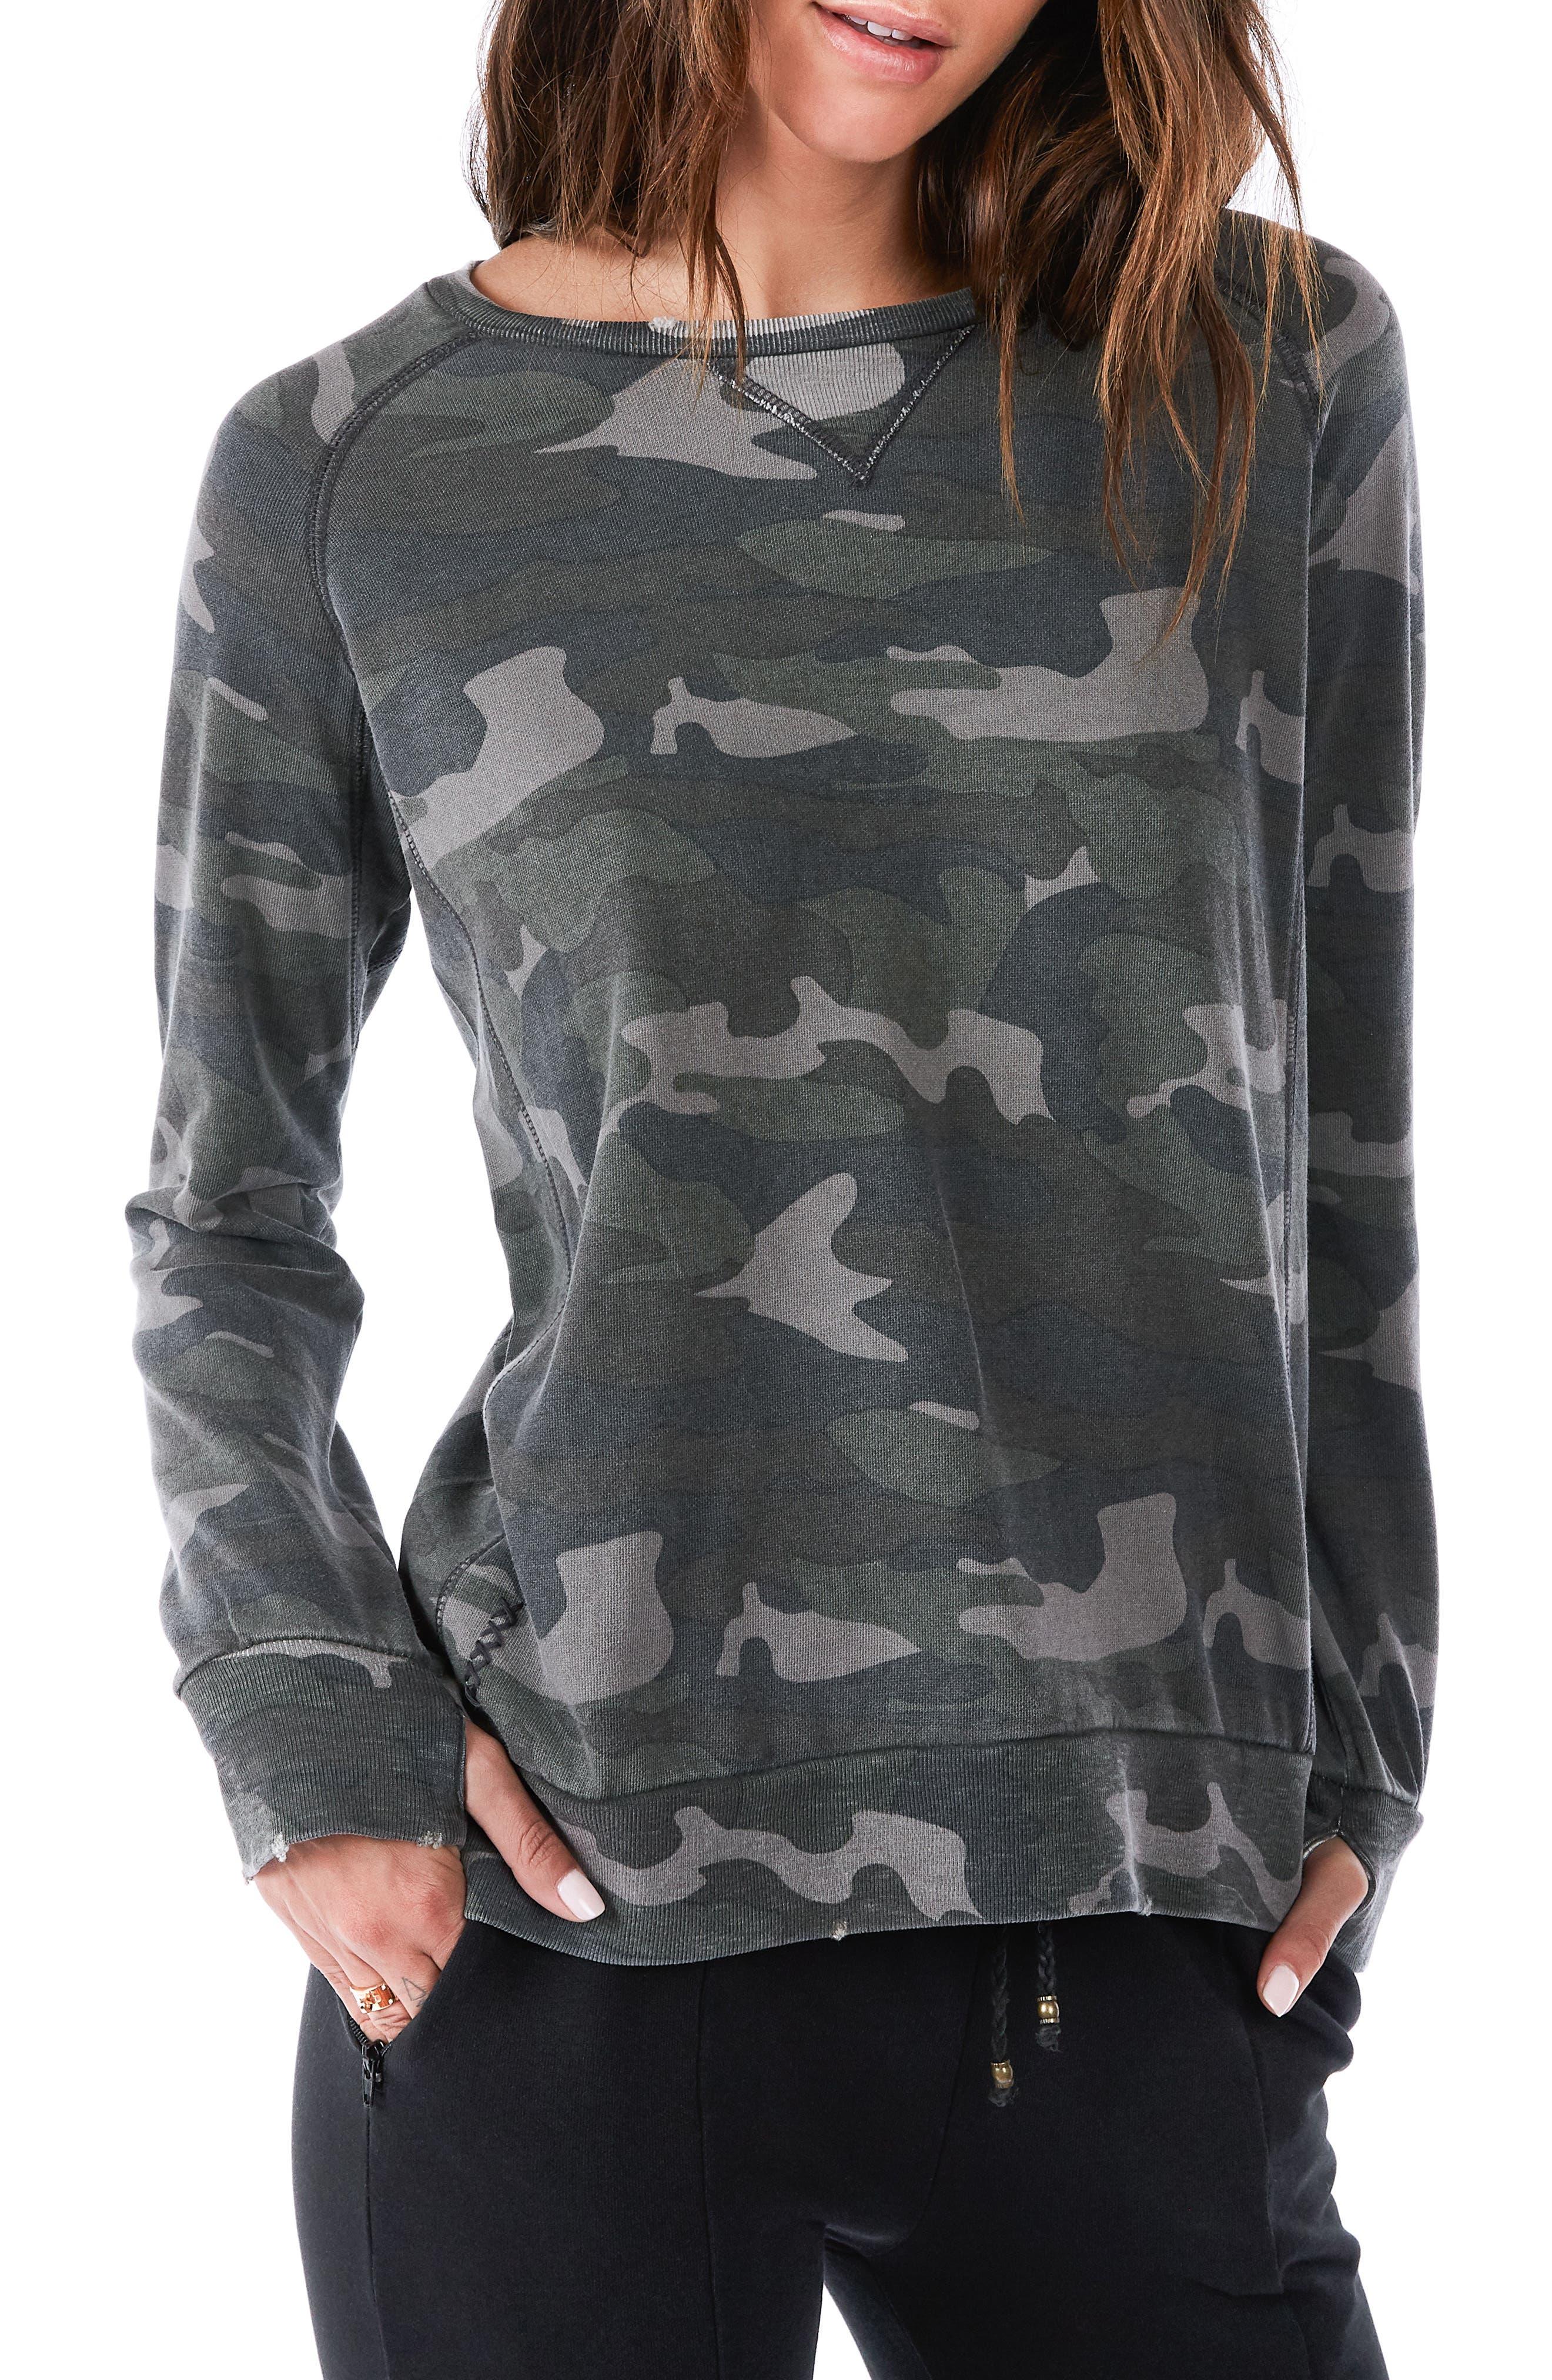 Main Image - Ragdoll Distressed Camo Sweatshirt